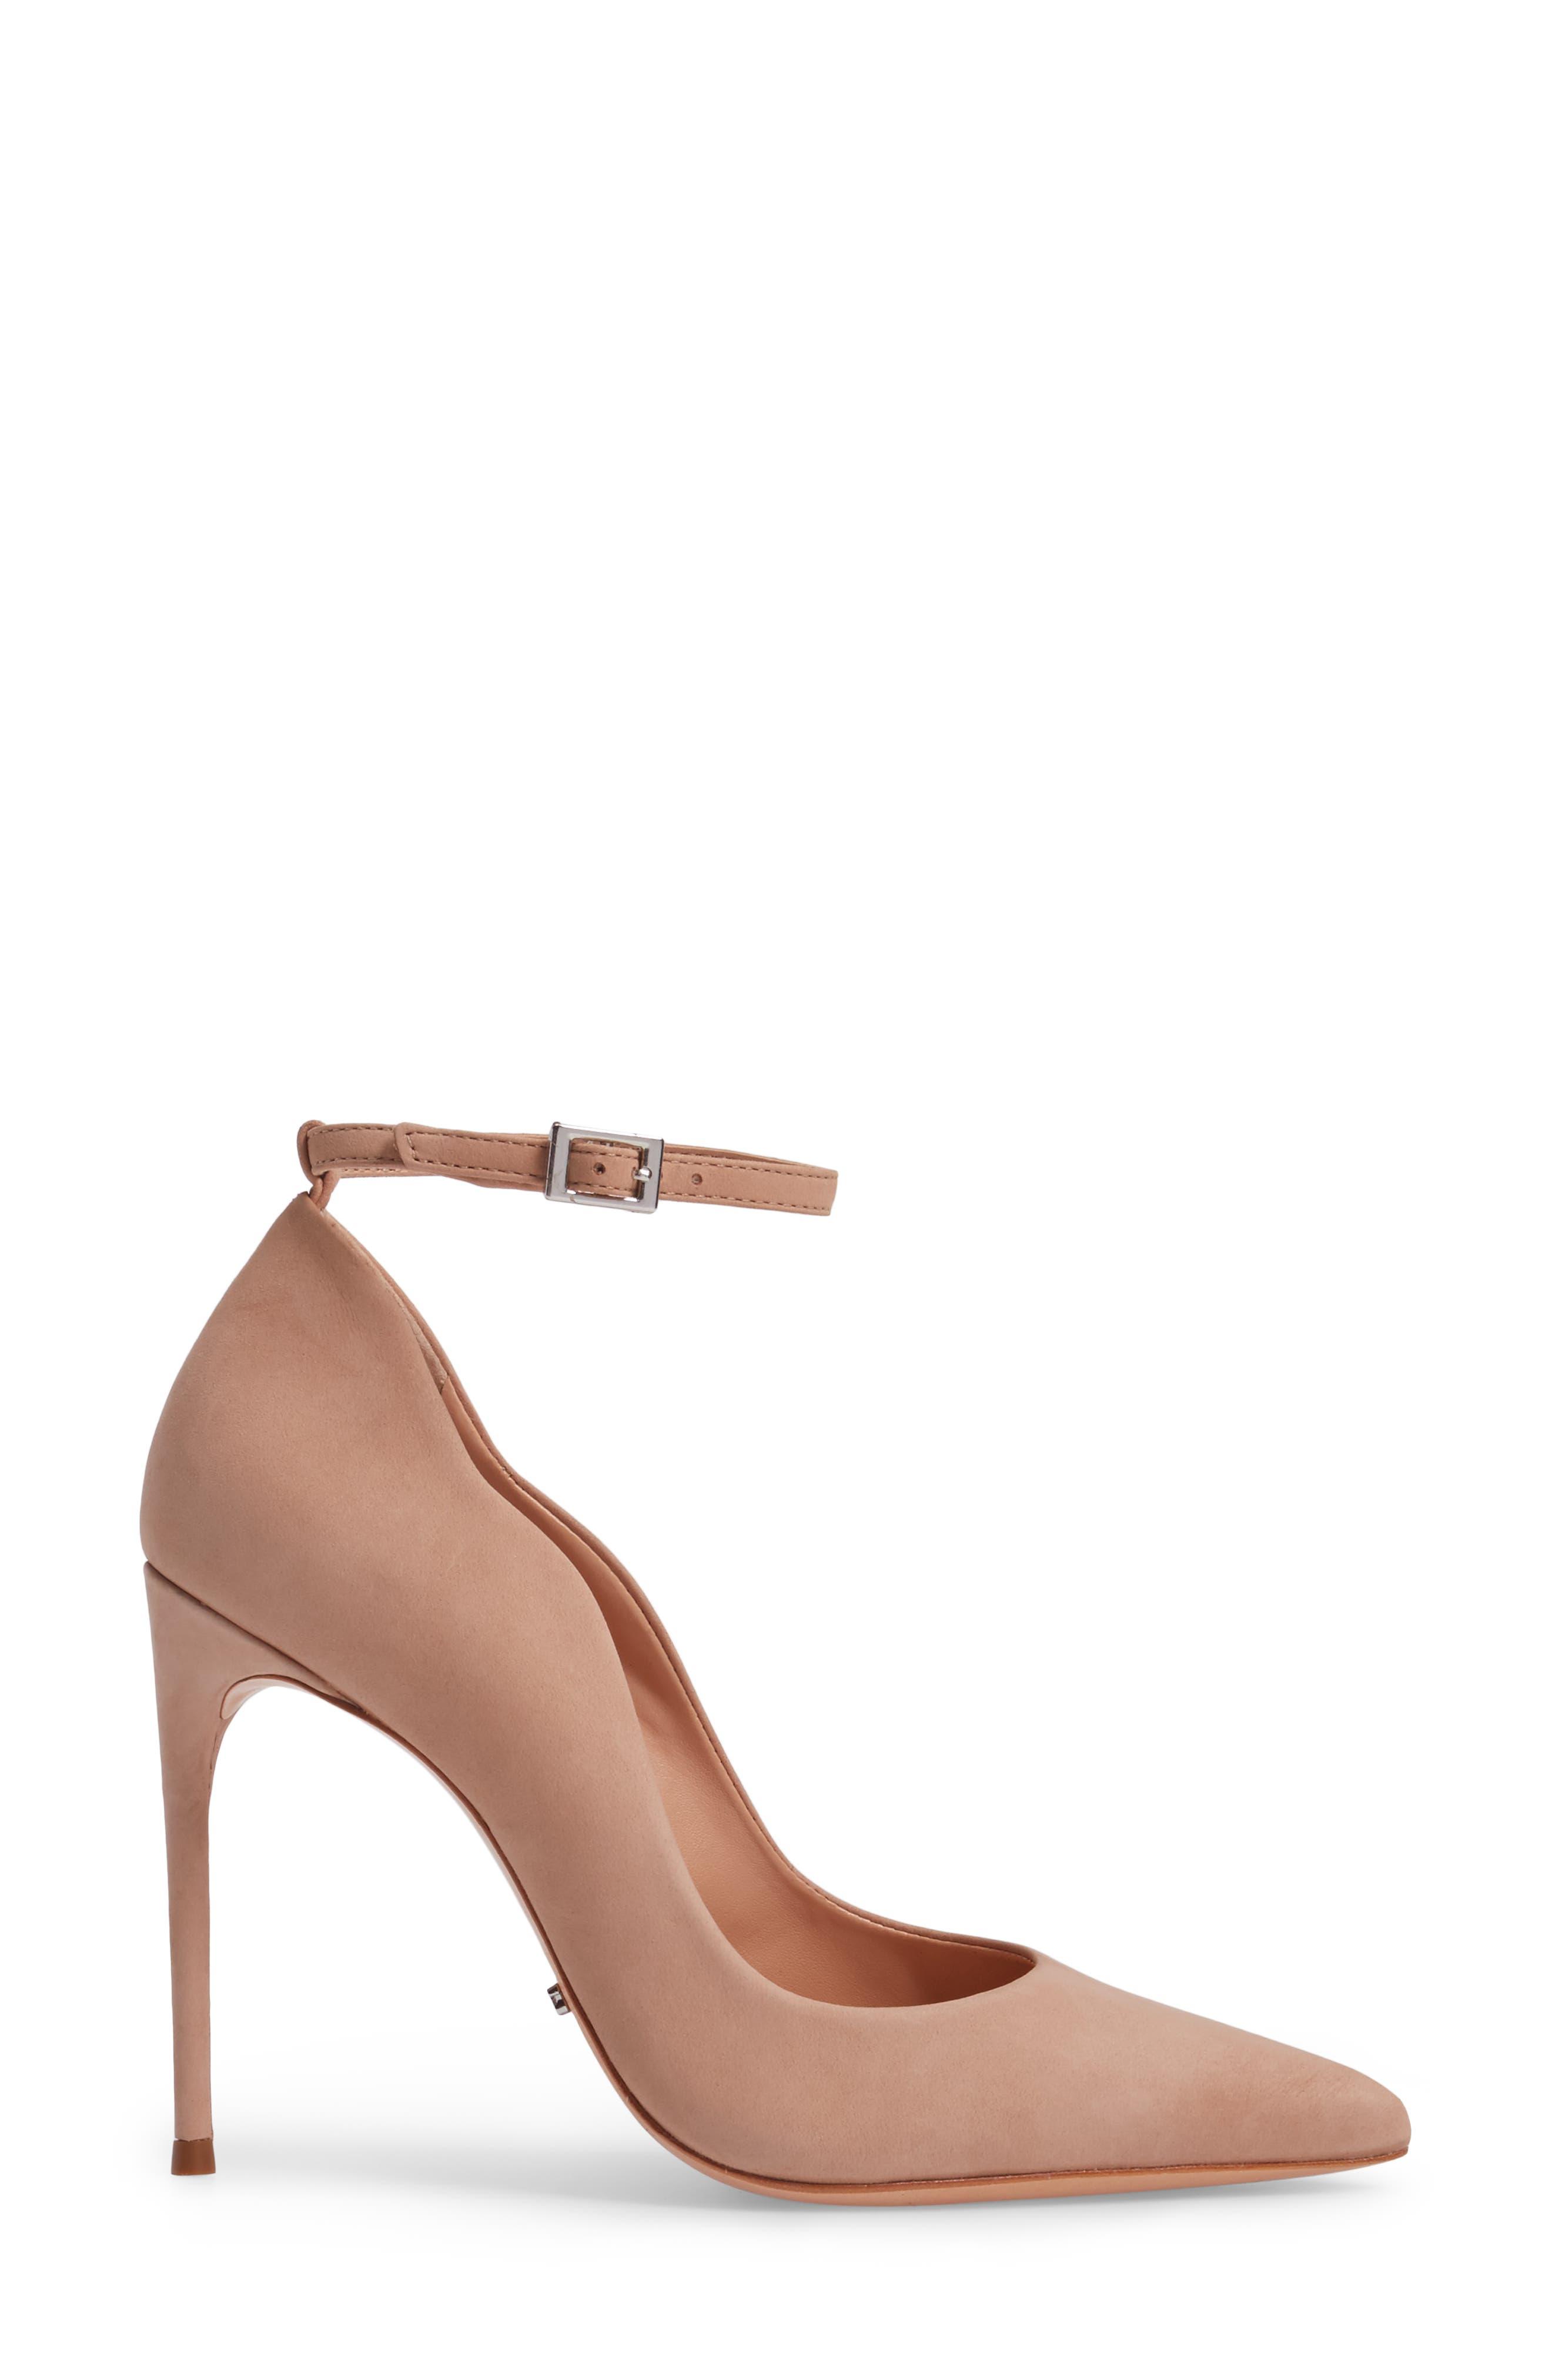 Thaynara Ankle Strap Pump,                             Alternate thumbnail 3, color,                             Amendoa Nubuck Leather